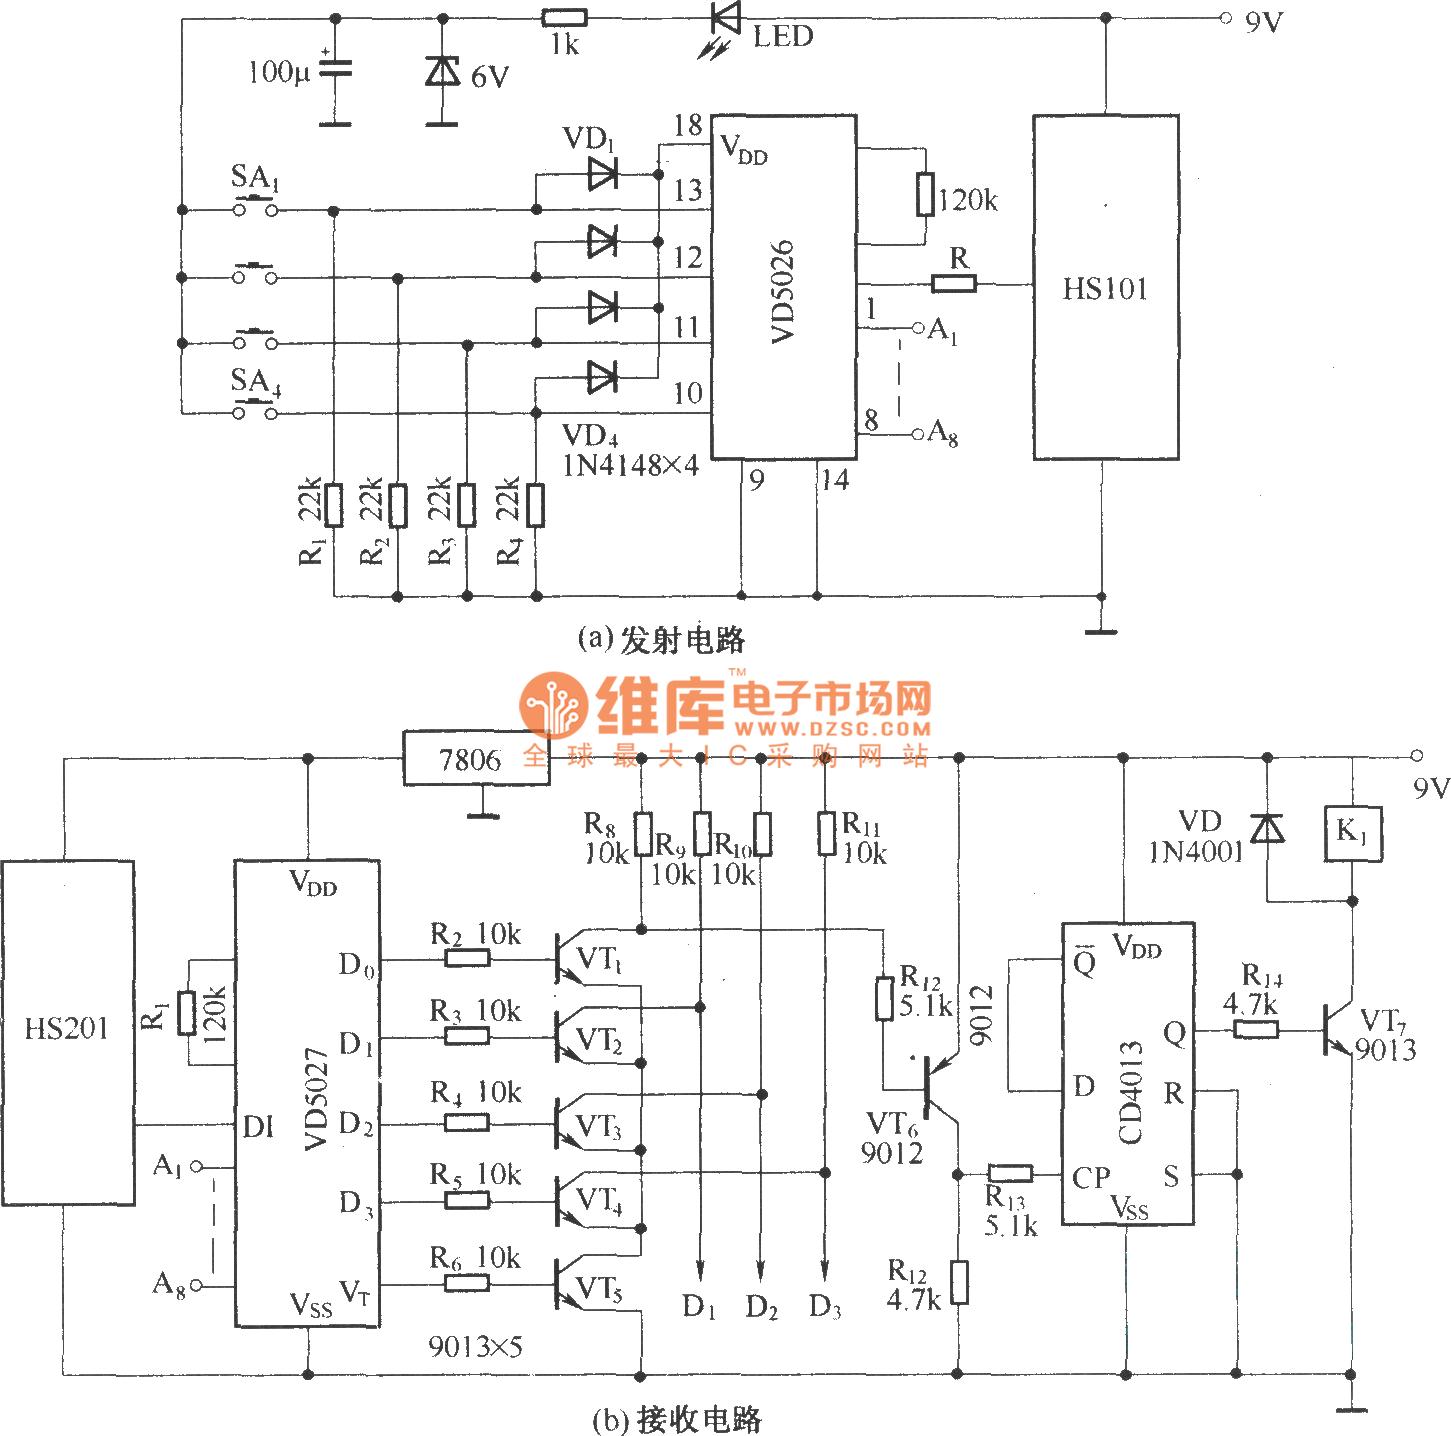 Remote Control Fan Circuit Diagram Pdf - Diagram